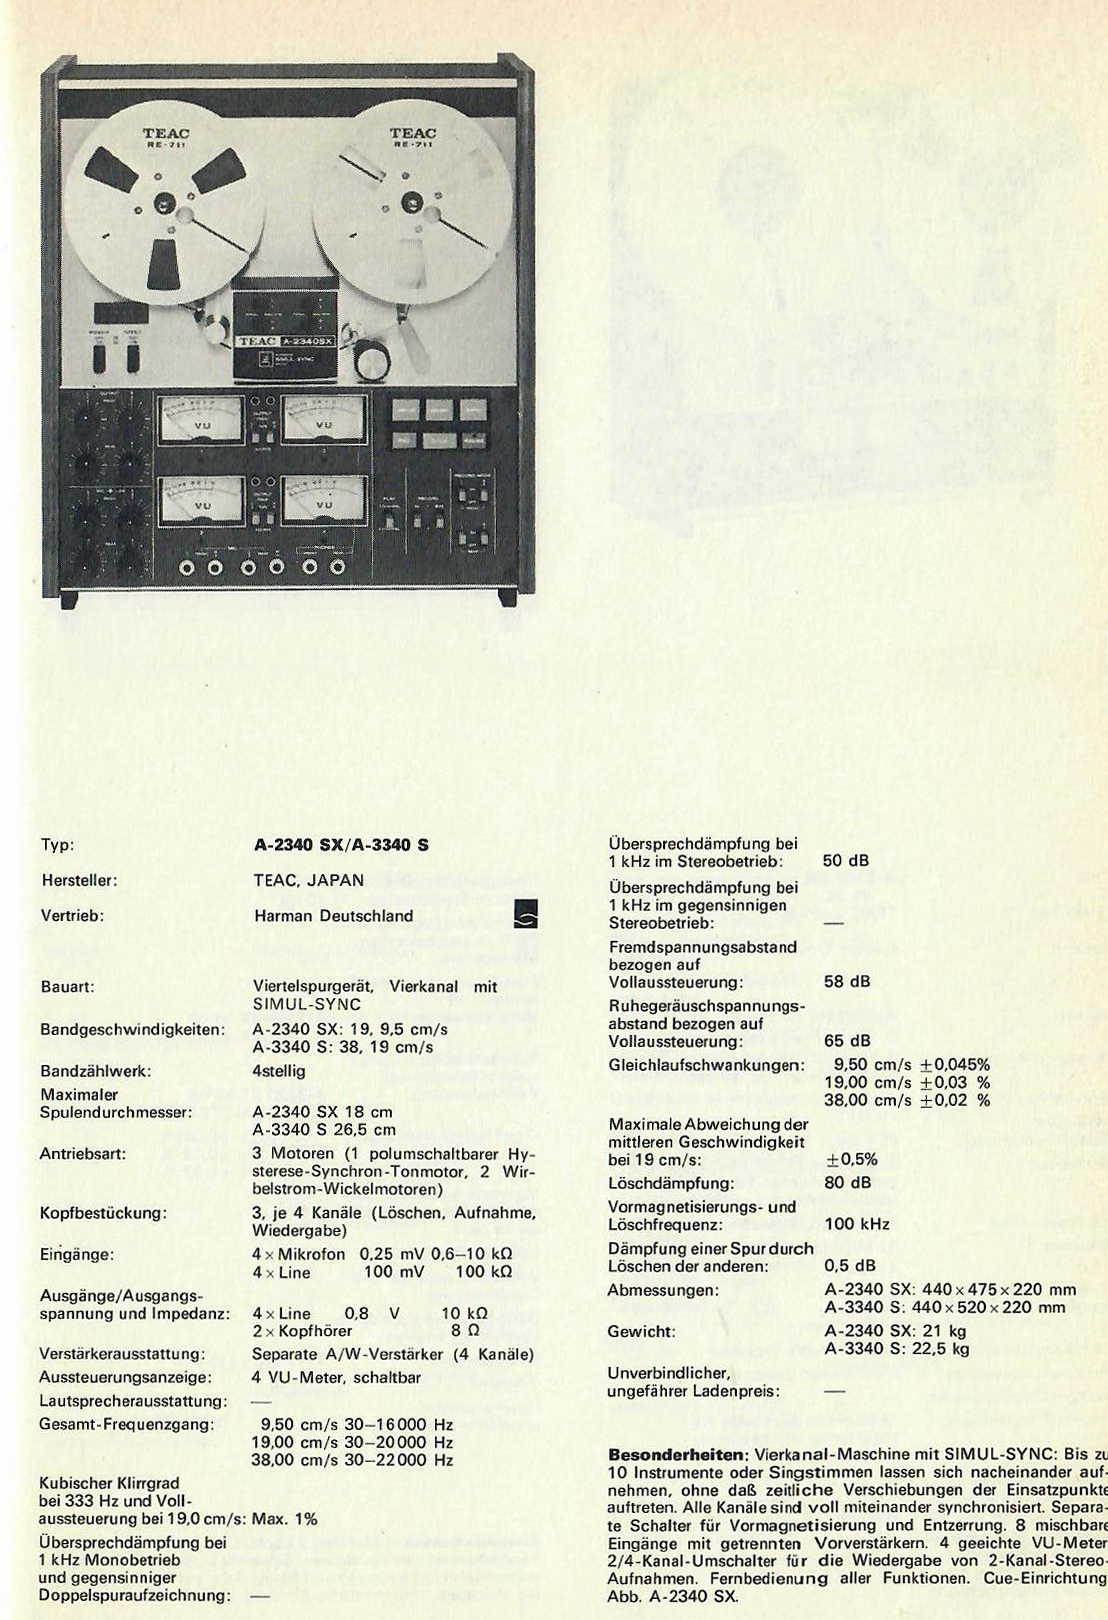 teac a-2340sx manual thread tape how to